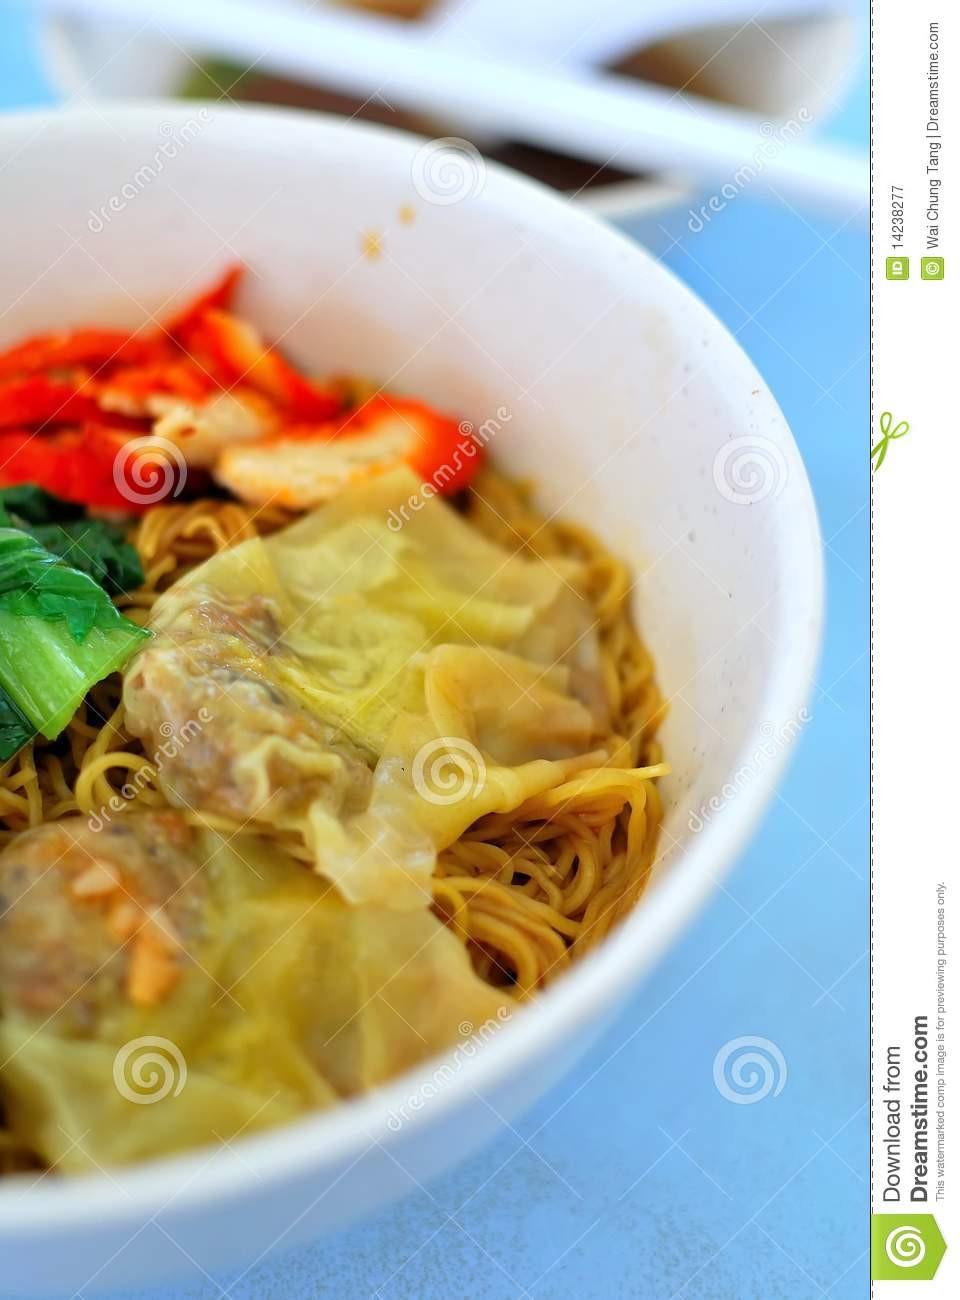 Healthy Vegetarian Dumplings  Asian Pork Dumpling Noodles Royalty Free Stock graphy